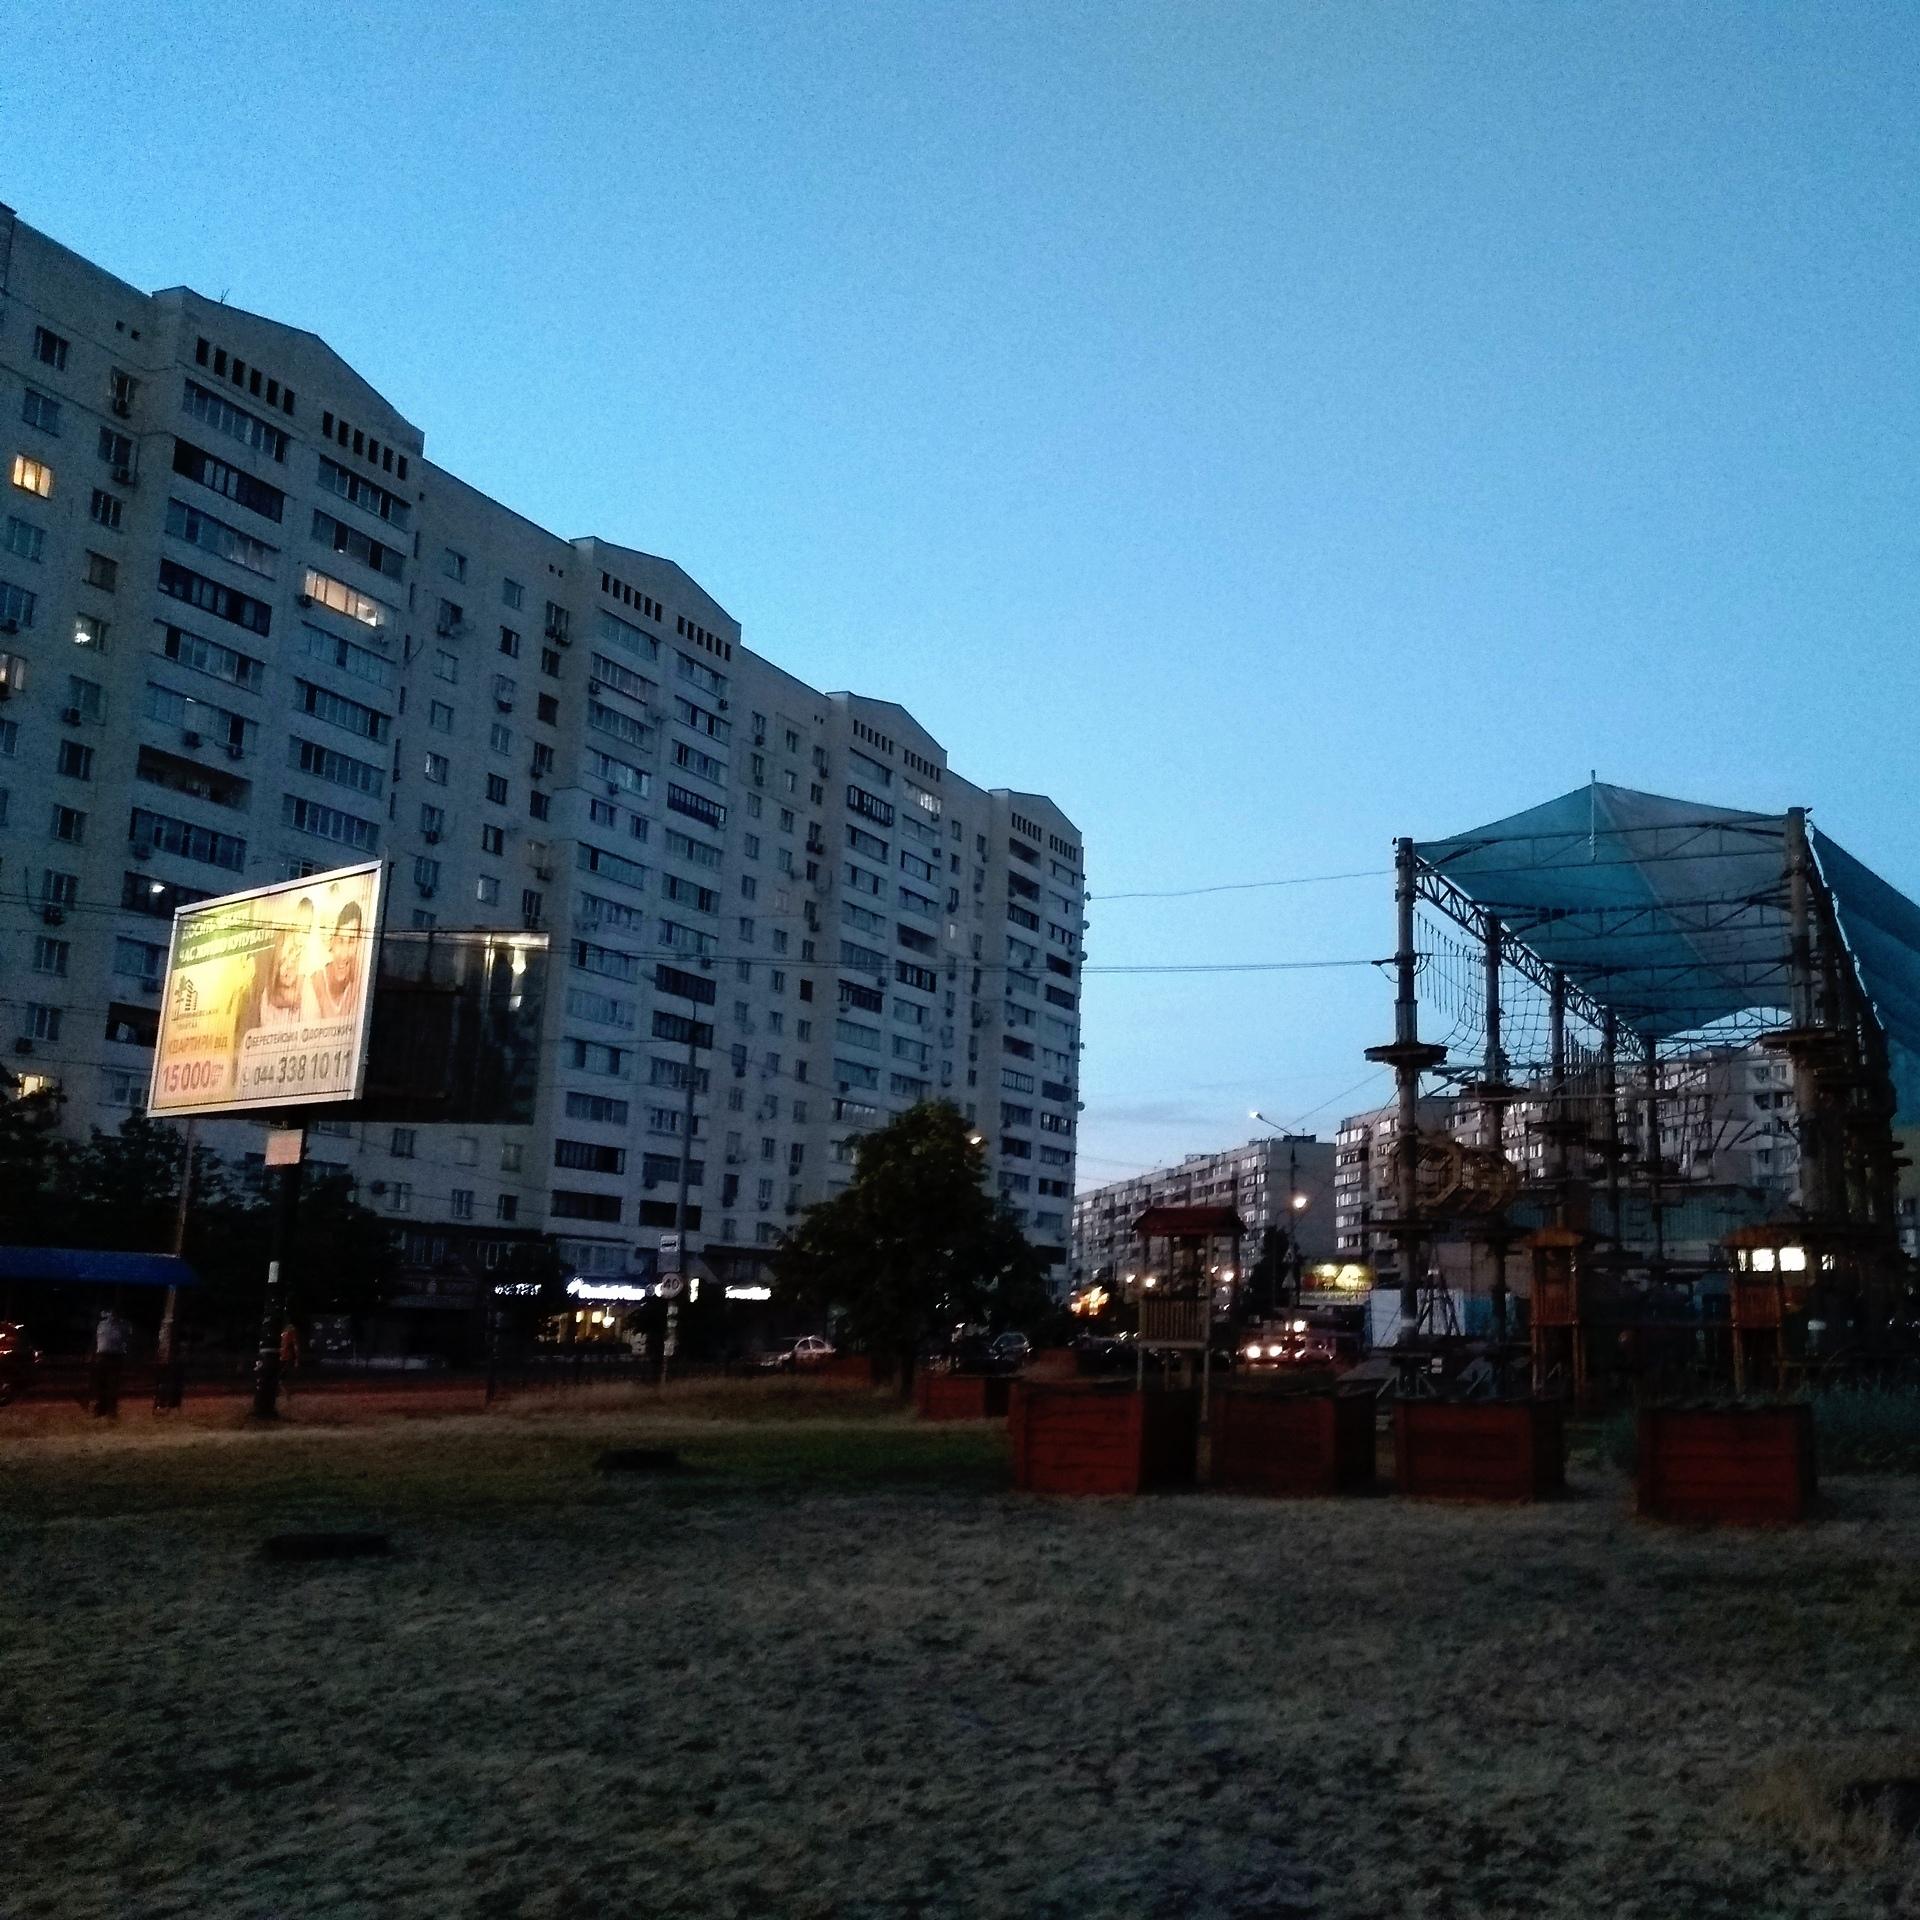 Елена Руденко (Валтея). Украина. Киев. Фото и описание.  VbnlmgSFJSo